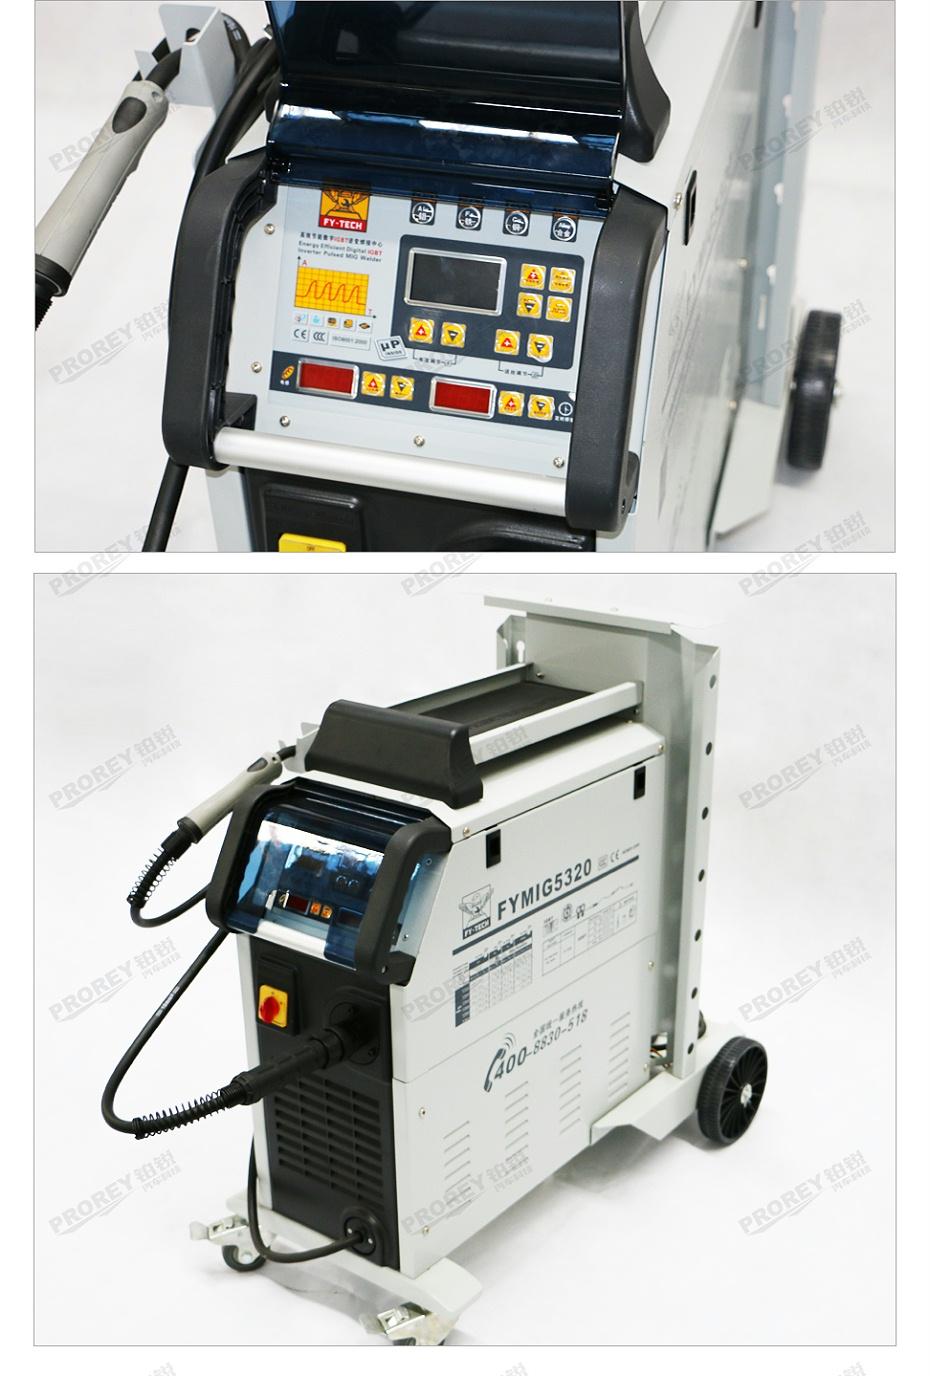 GW-140080022-飞鹰 FYMIG5320 逆变焊机-4